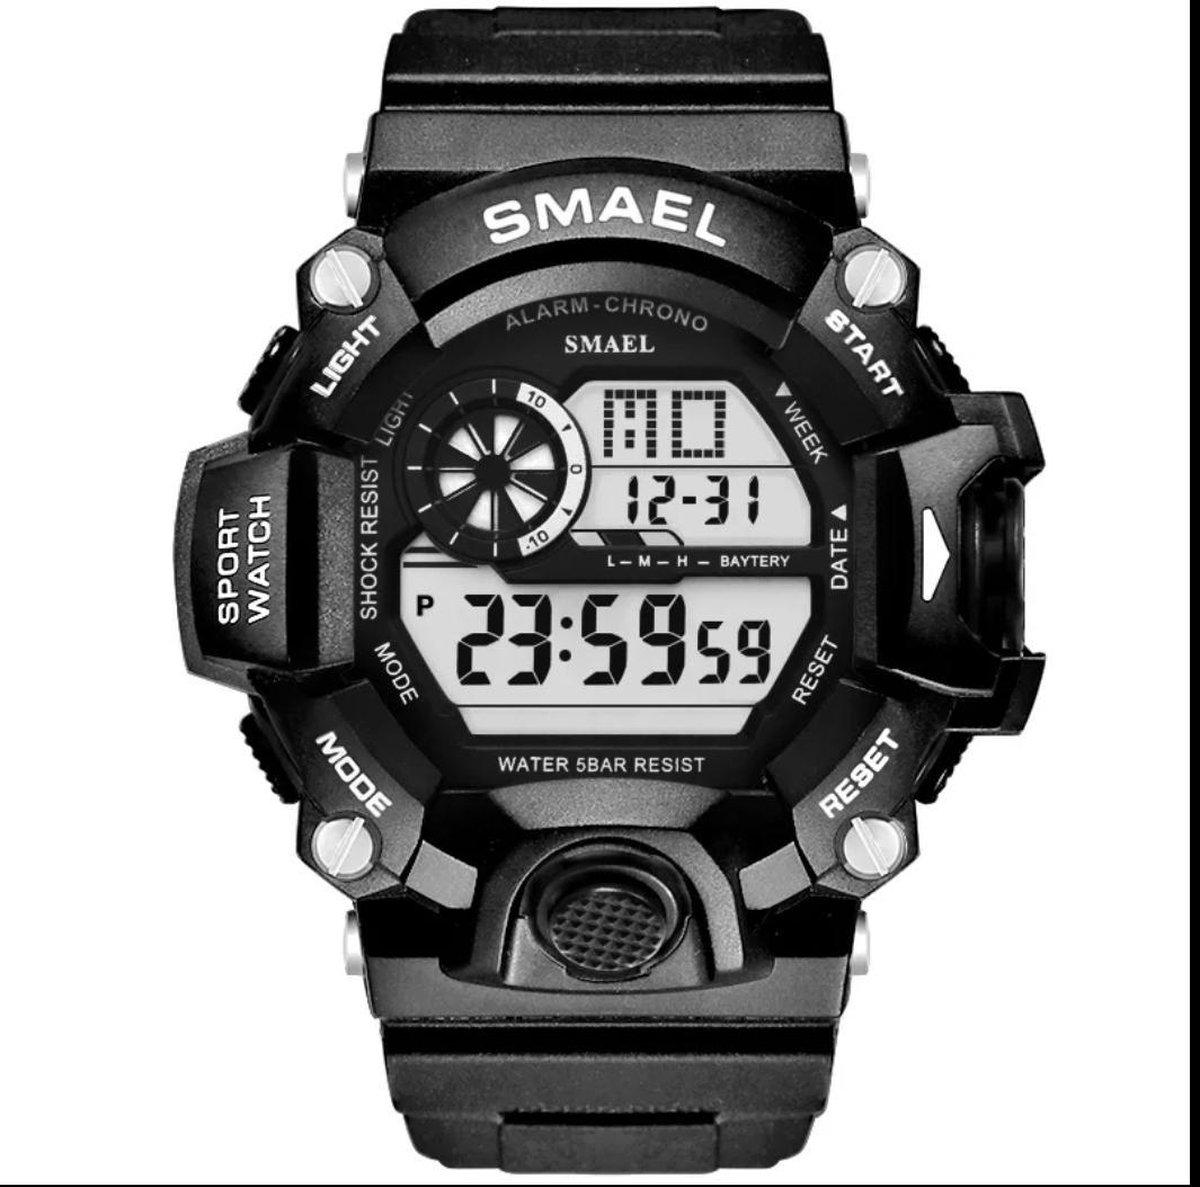 Smael Sport horloge Led Digital waterdicht White Black 1385B - Smael